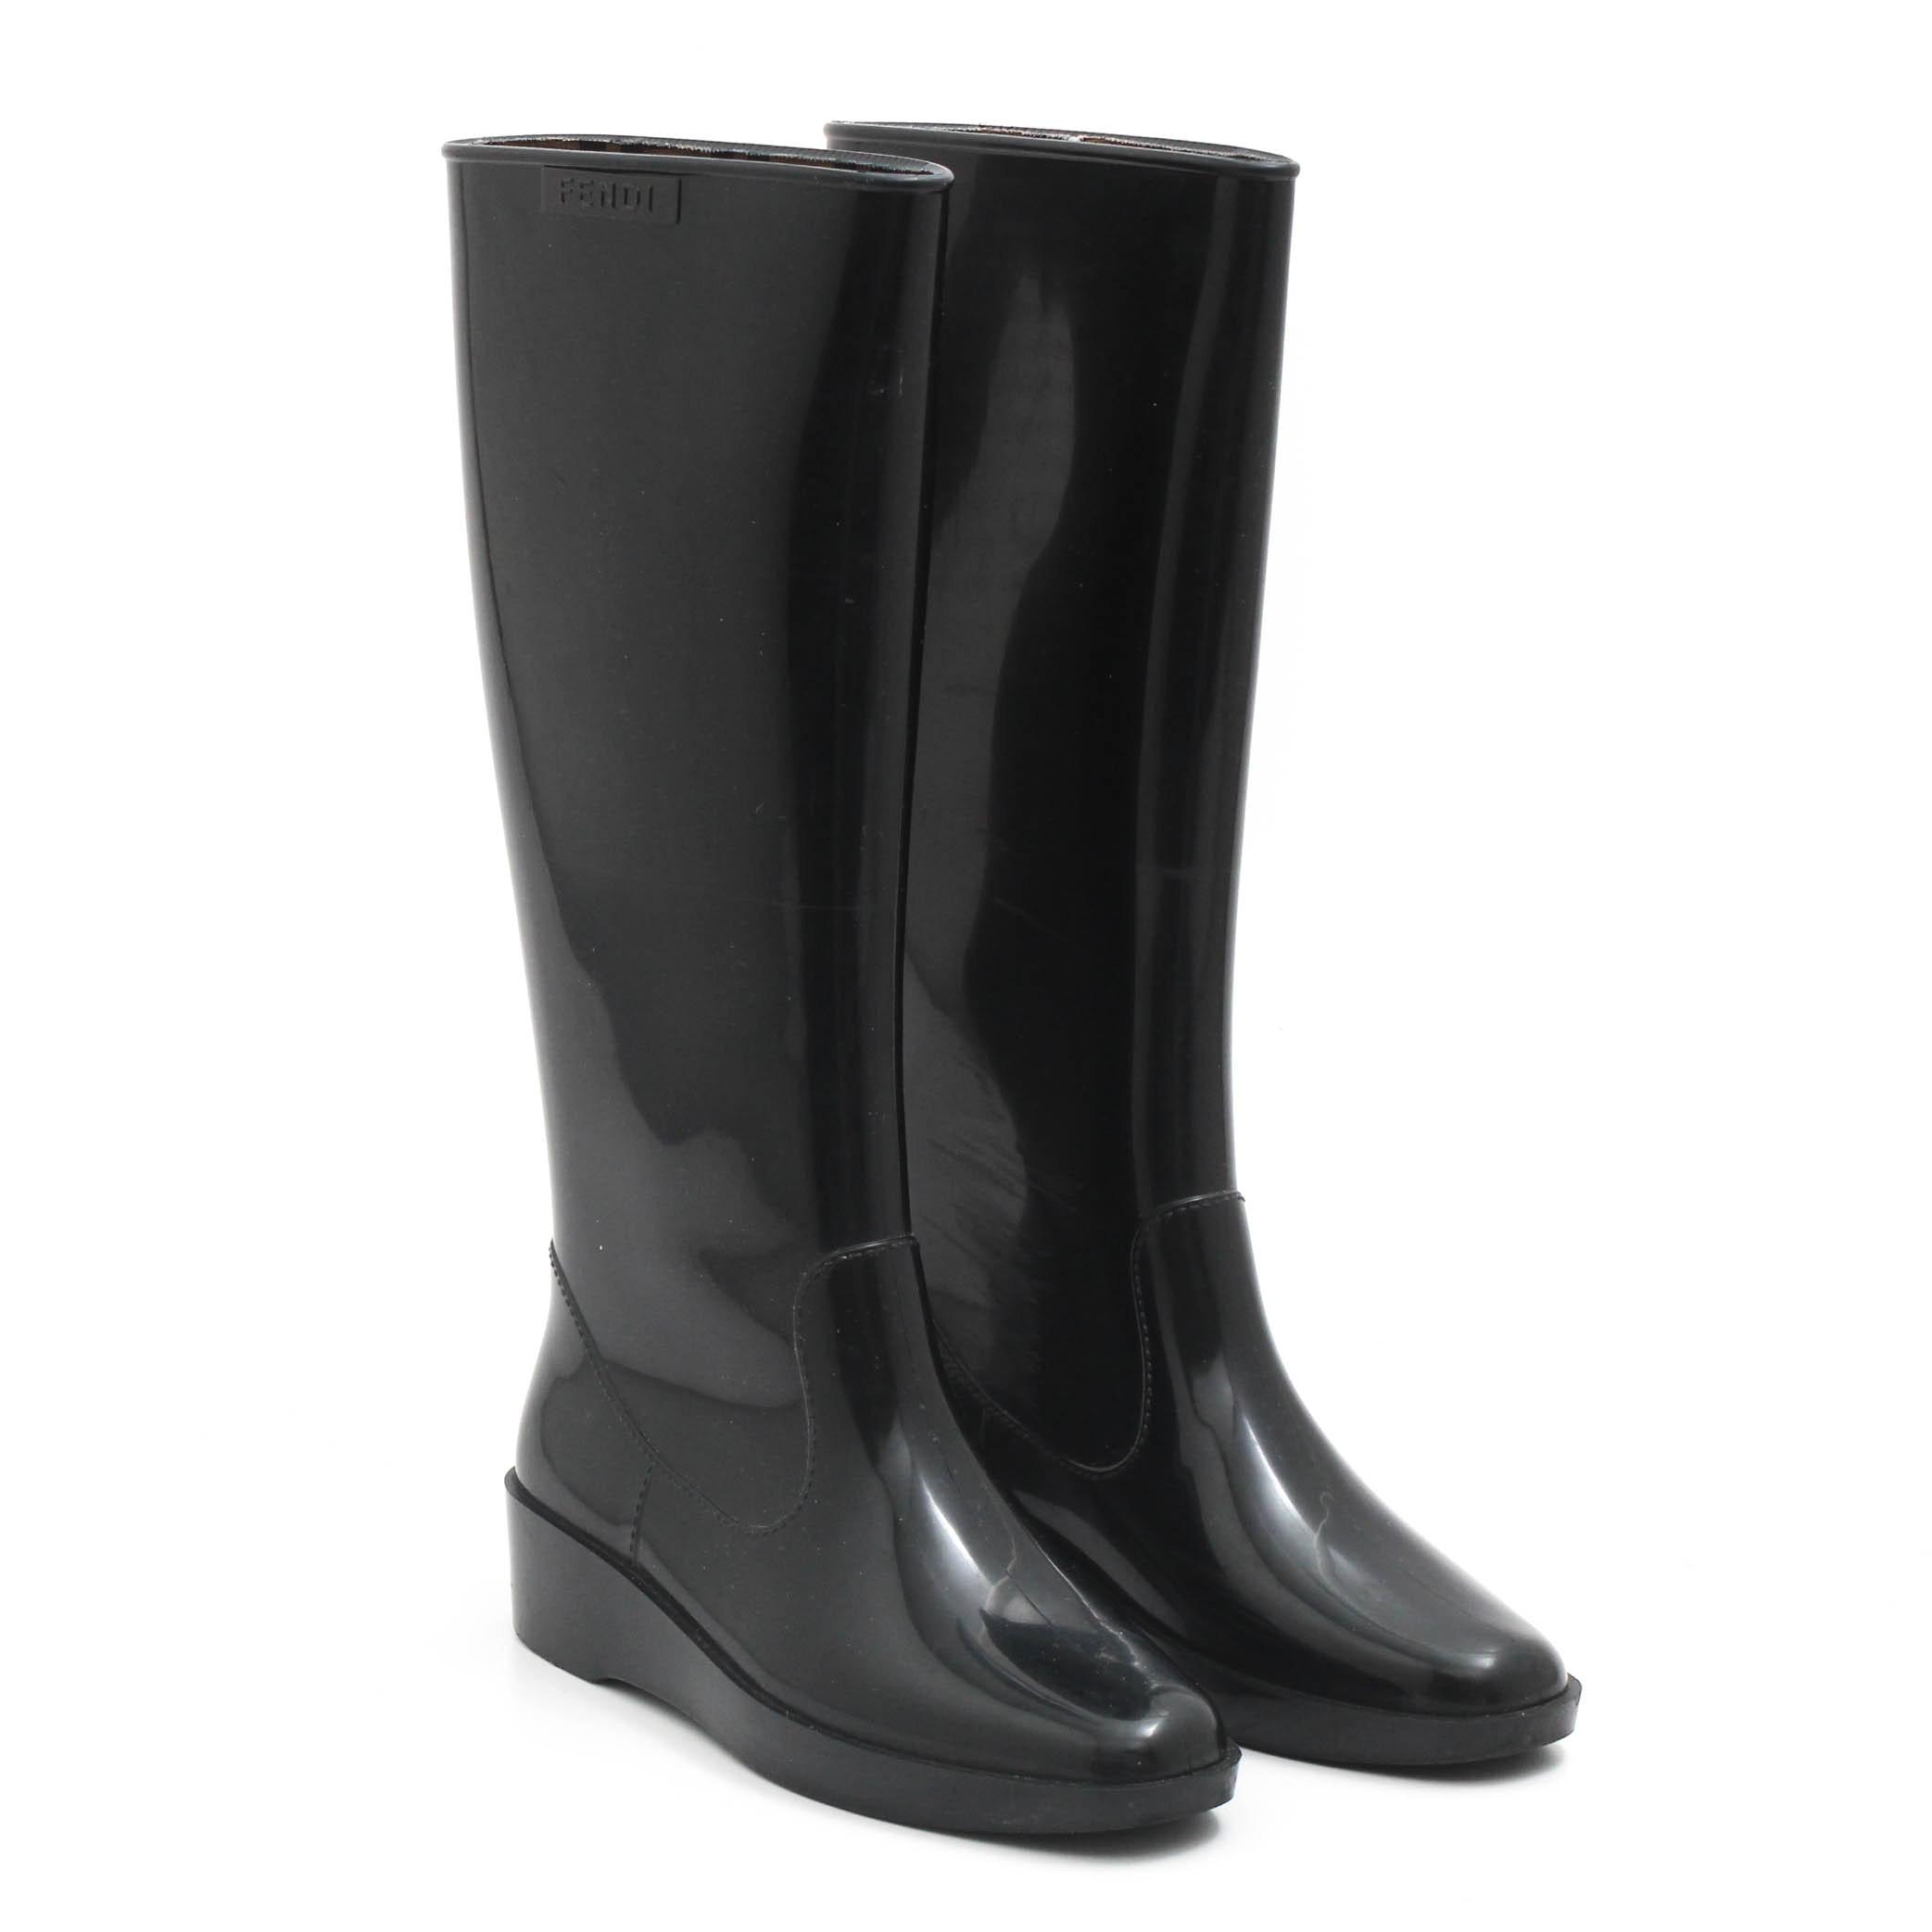 Women's Fendi Black Rubber Tall Rain Boots